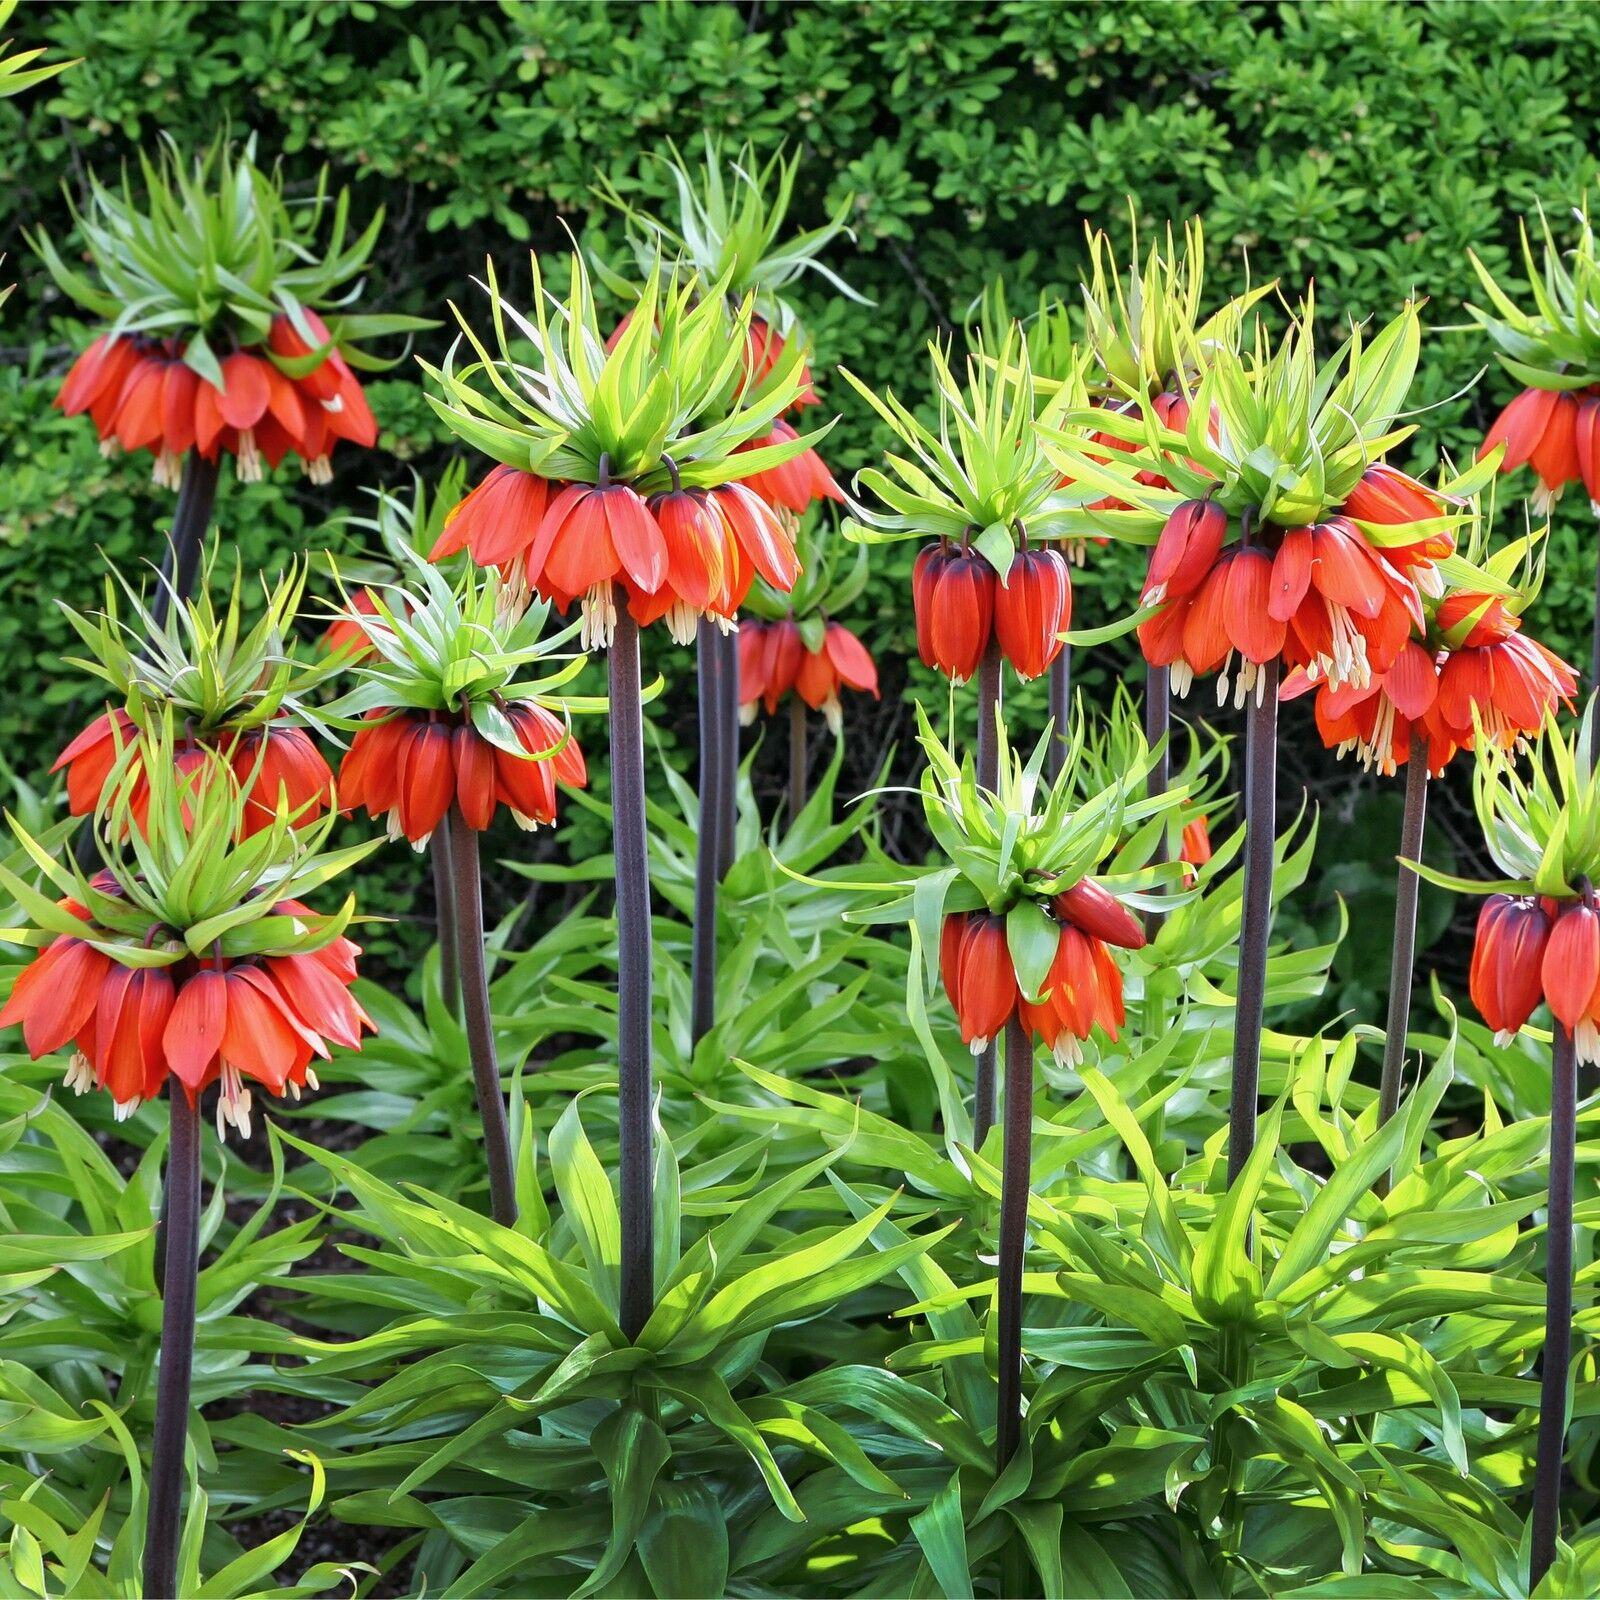 Fritillaria rubra crown imperial giant spring flowering bulbs fritillaria rubra crown imperial giant spring flowering bulbs perennials mightylinksfo